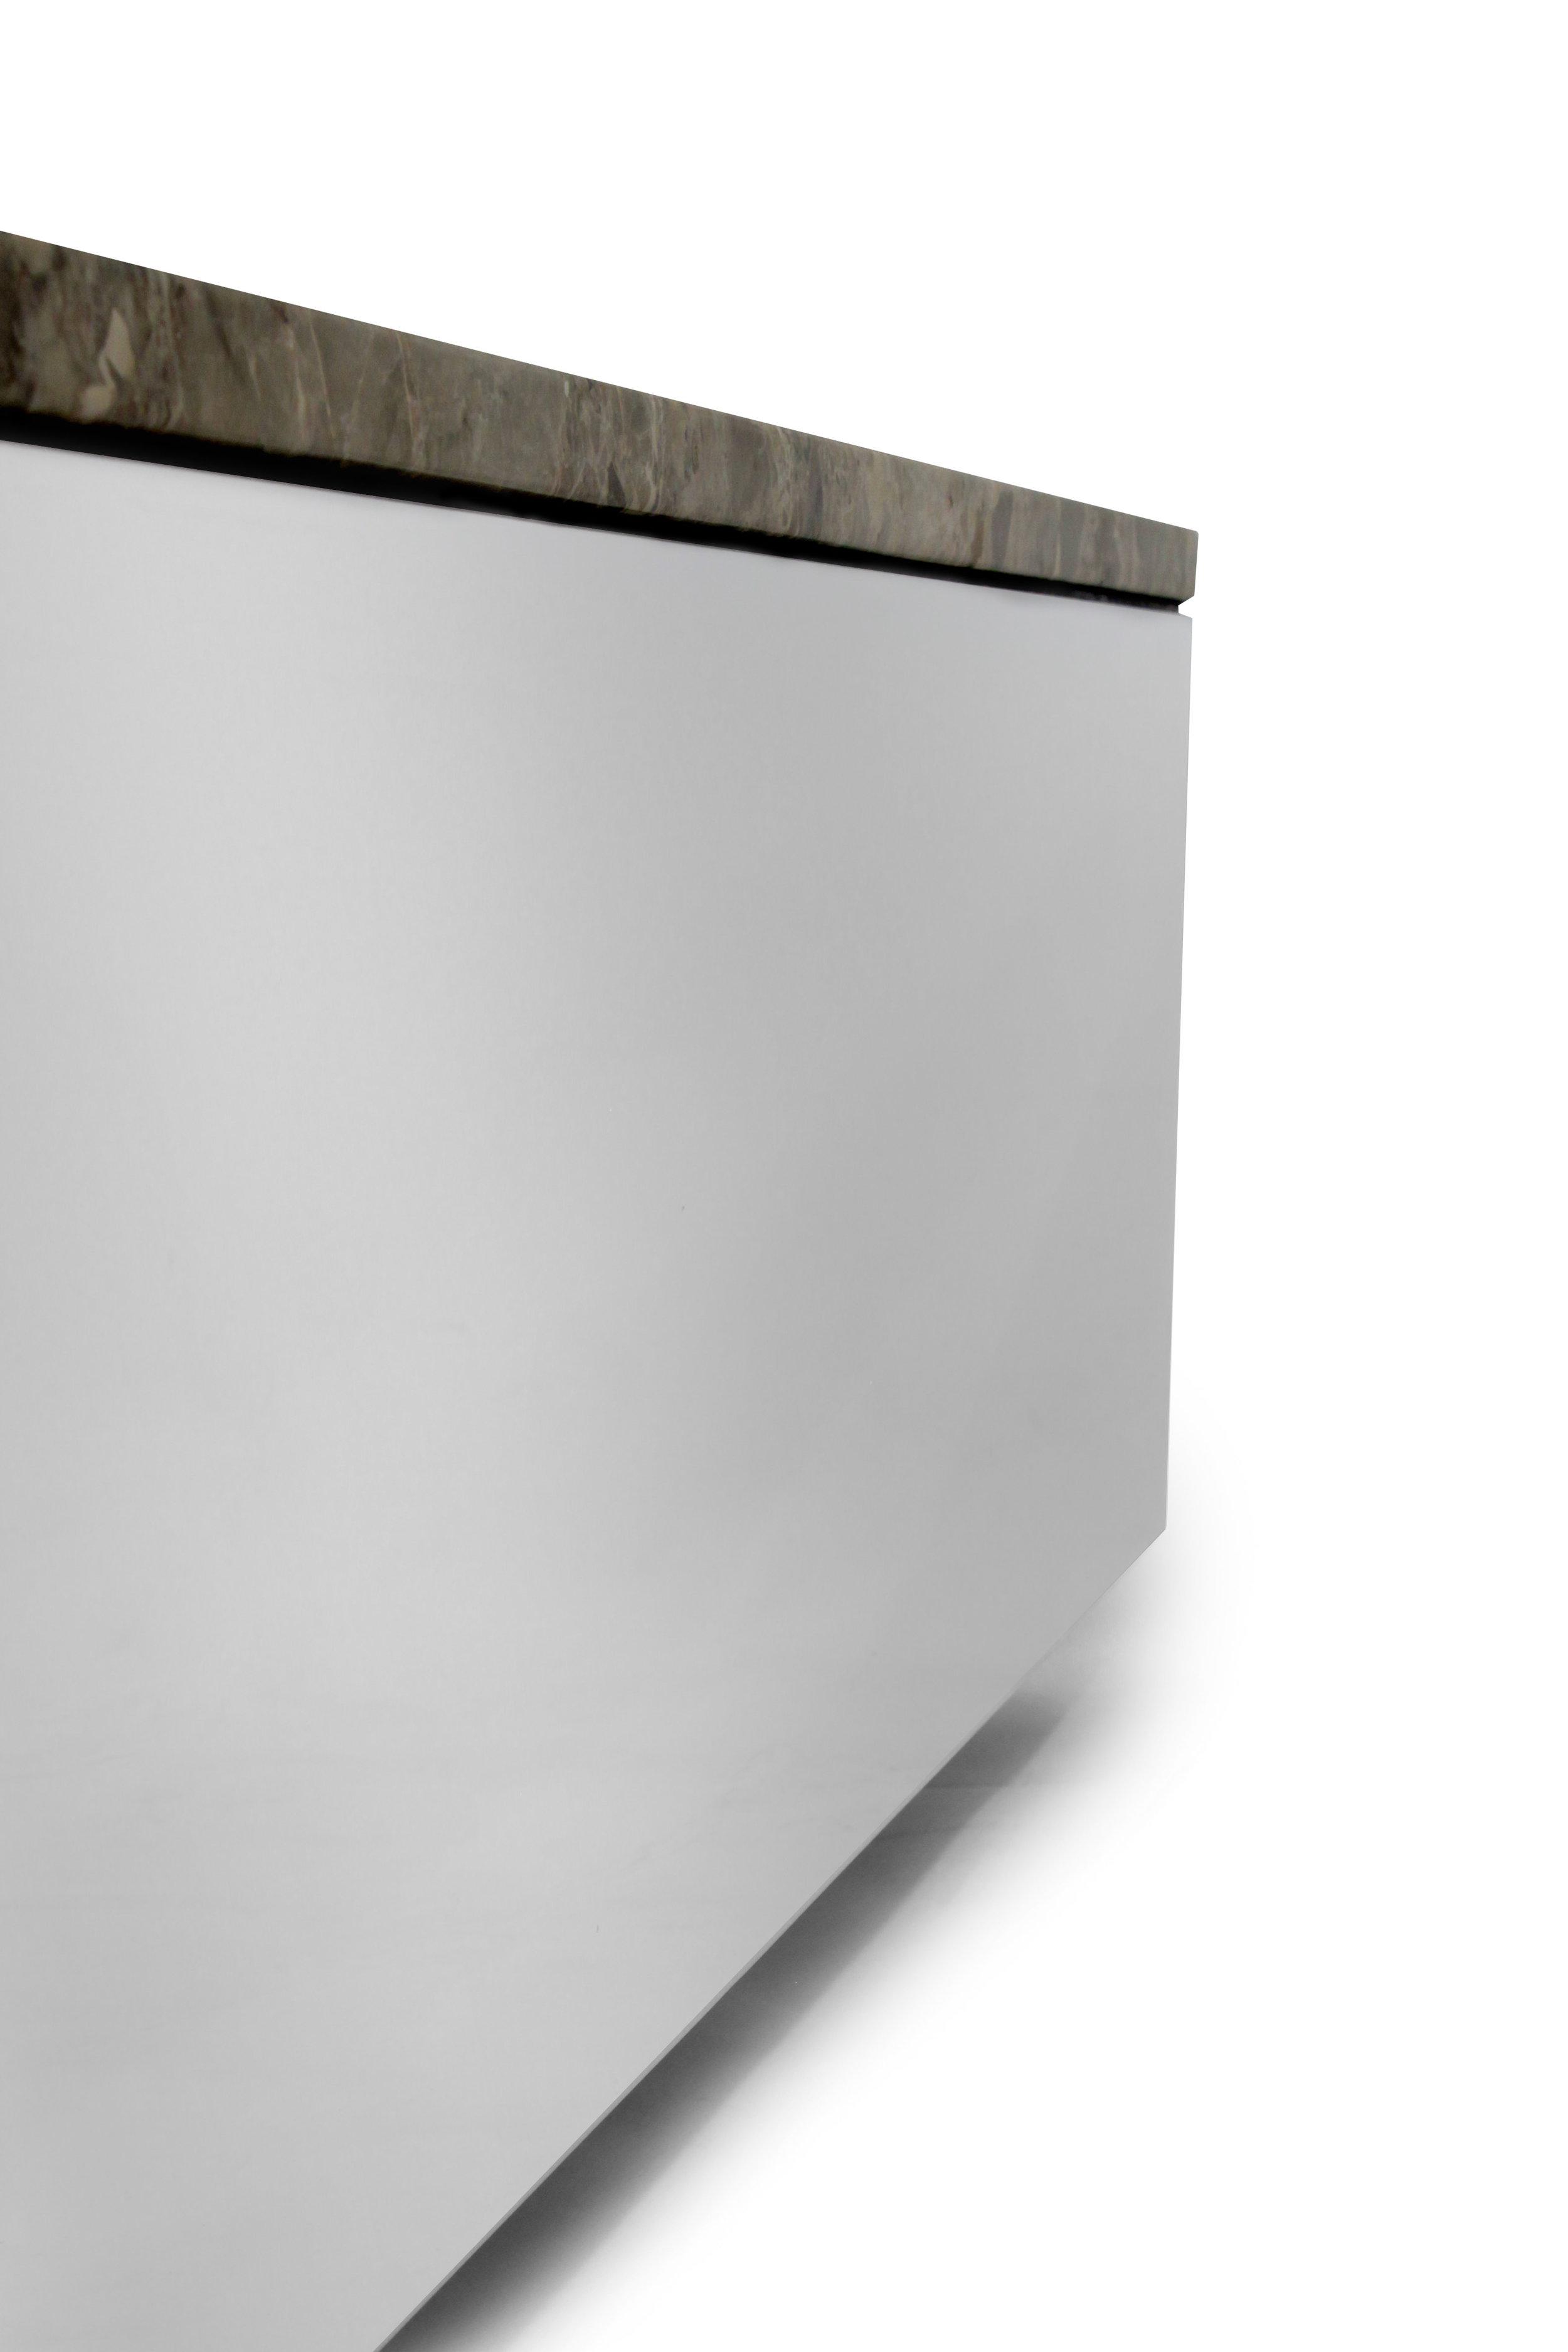 Brueton 85 polished steel+marble coffeetable75 detail4 hires.JPG